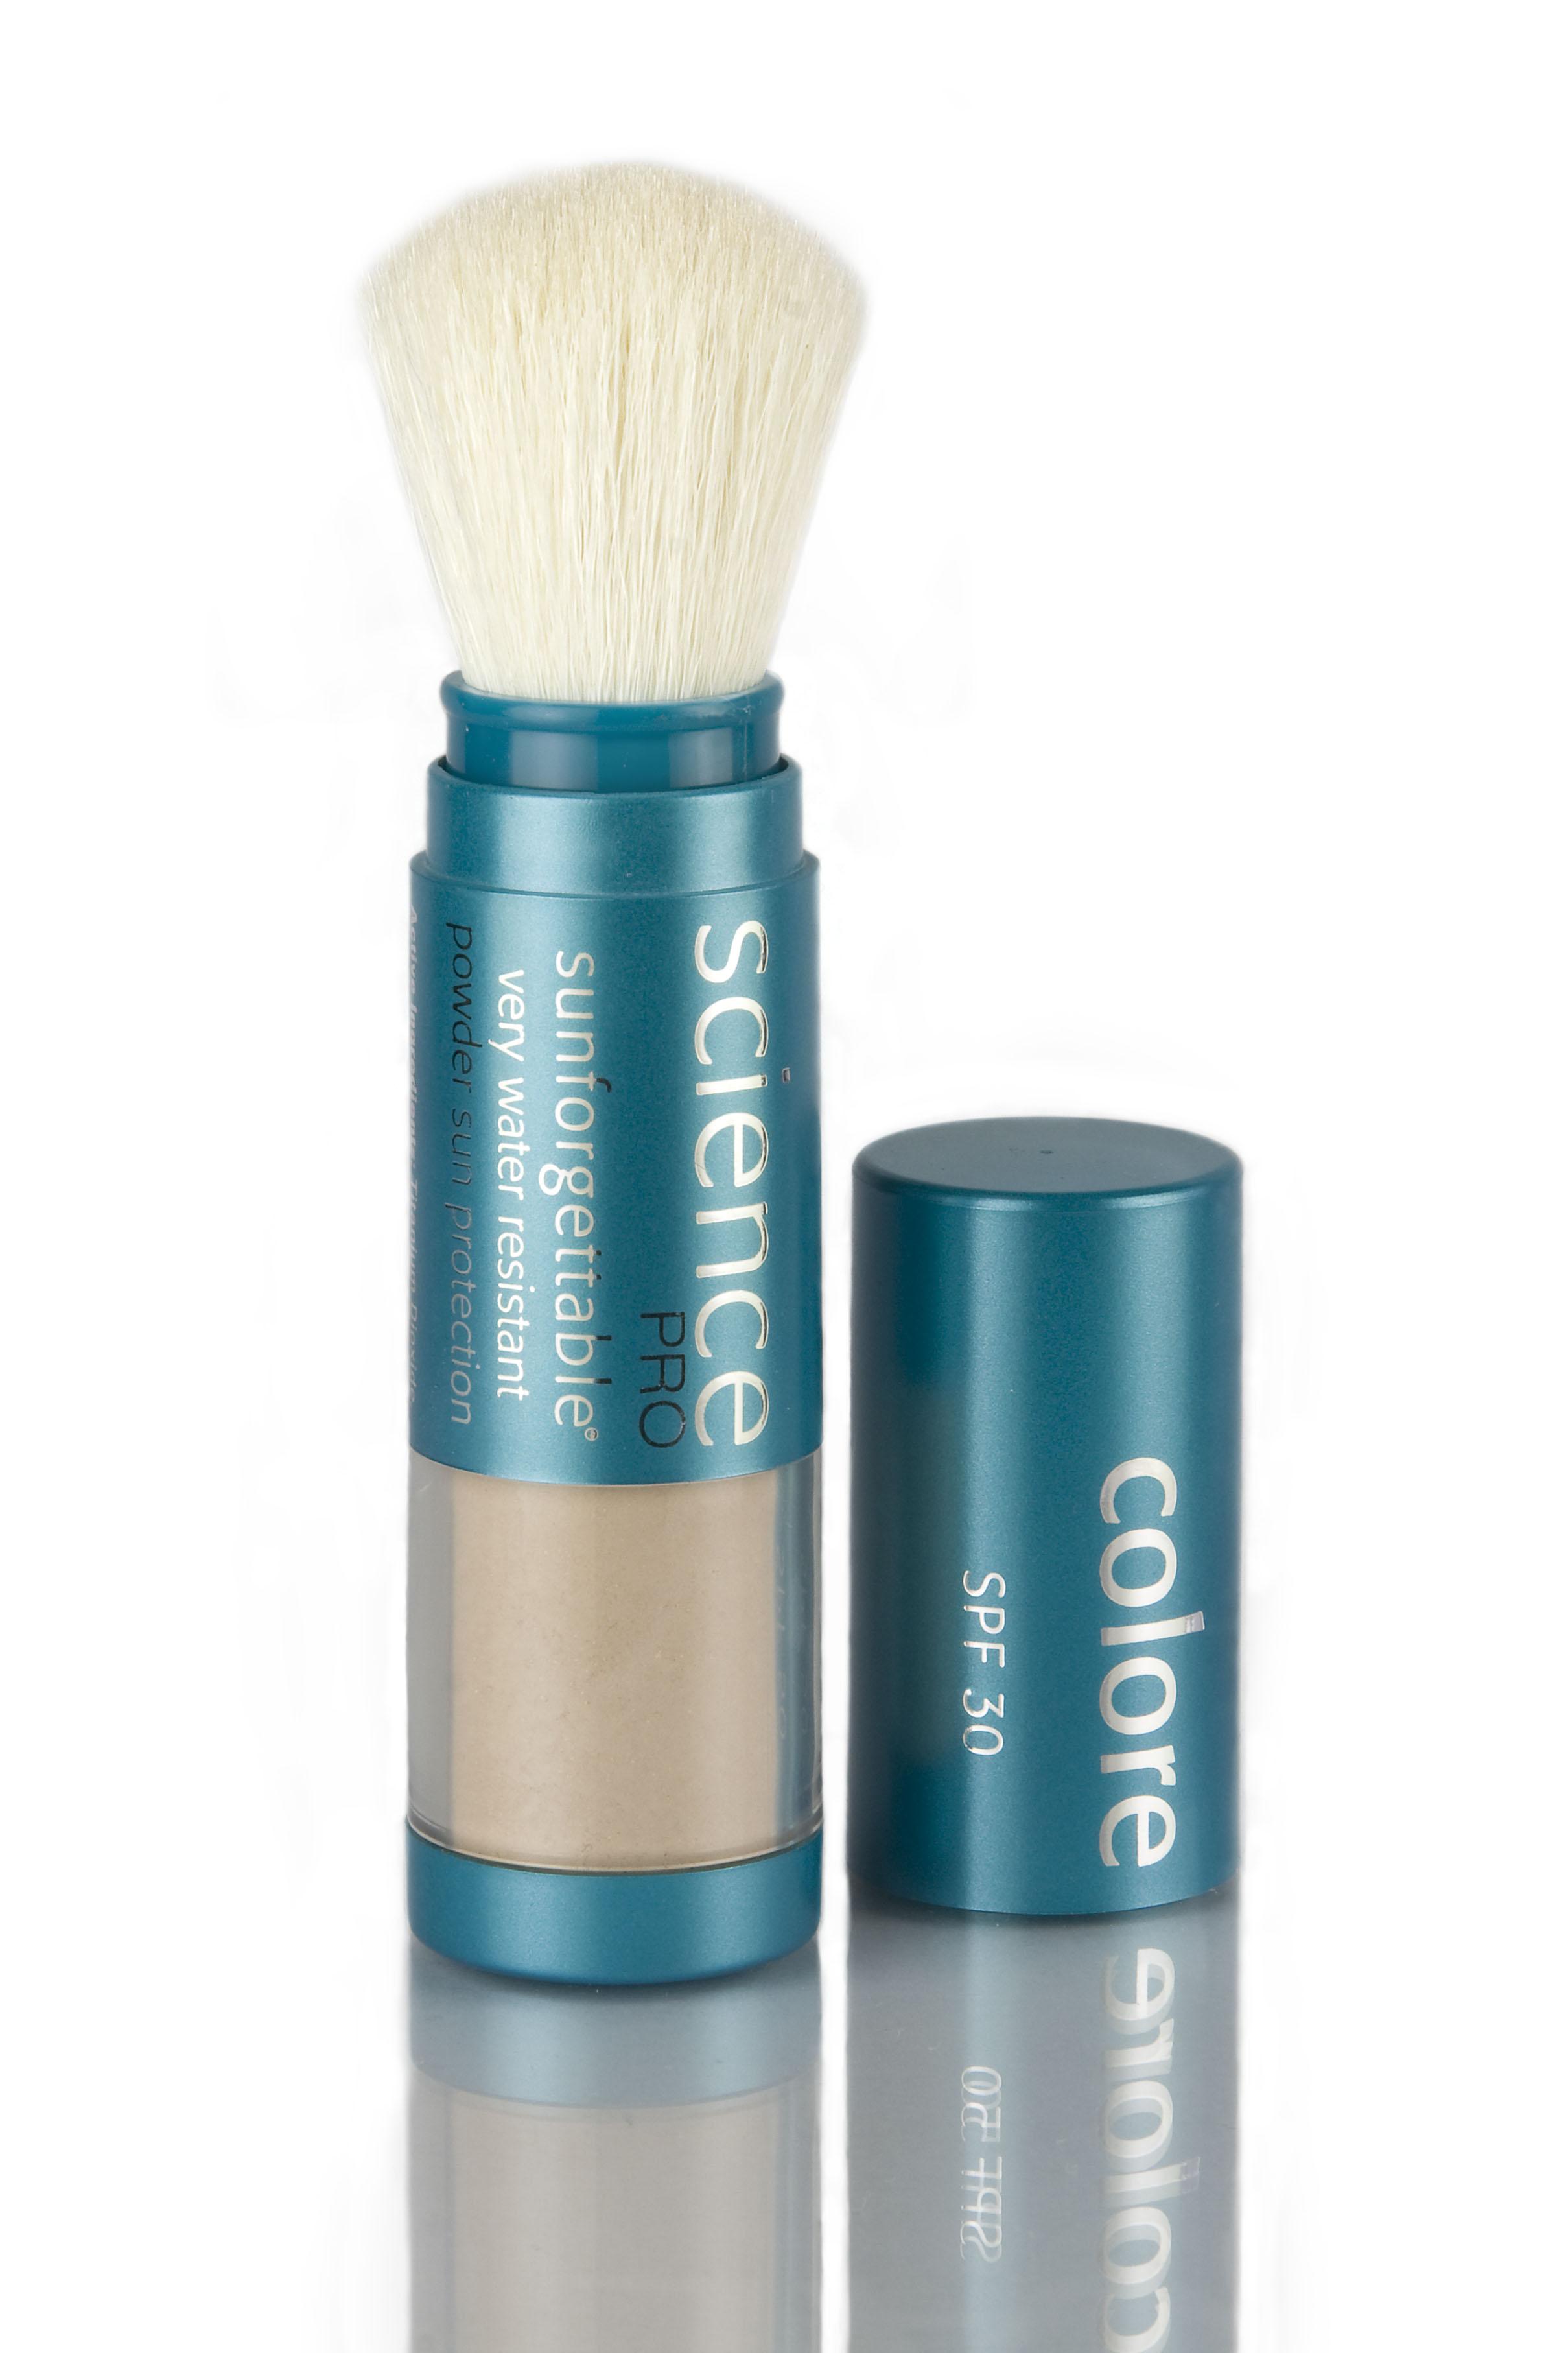 Colorescience SPF 30 Powder Brush_ CS Pro.jpg